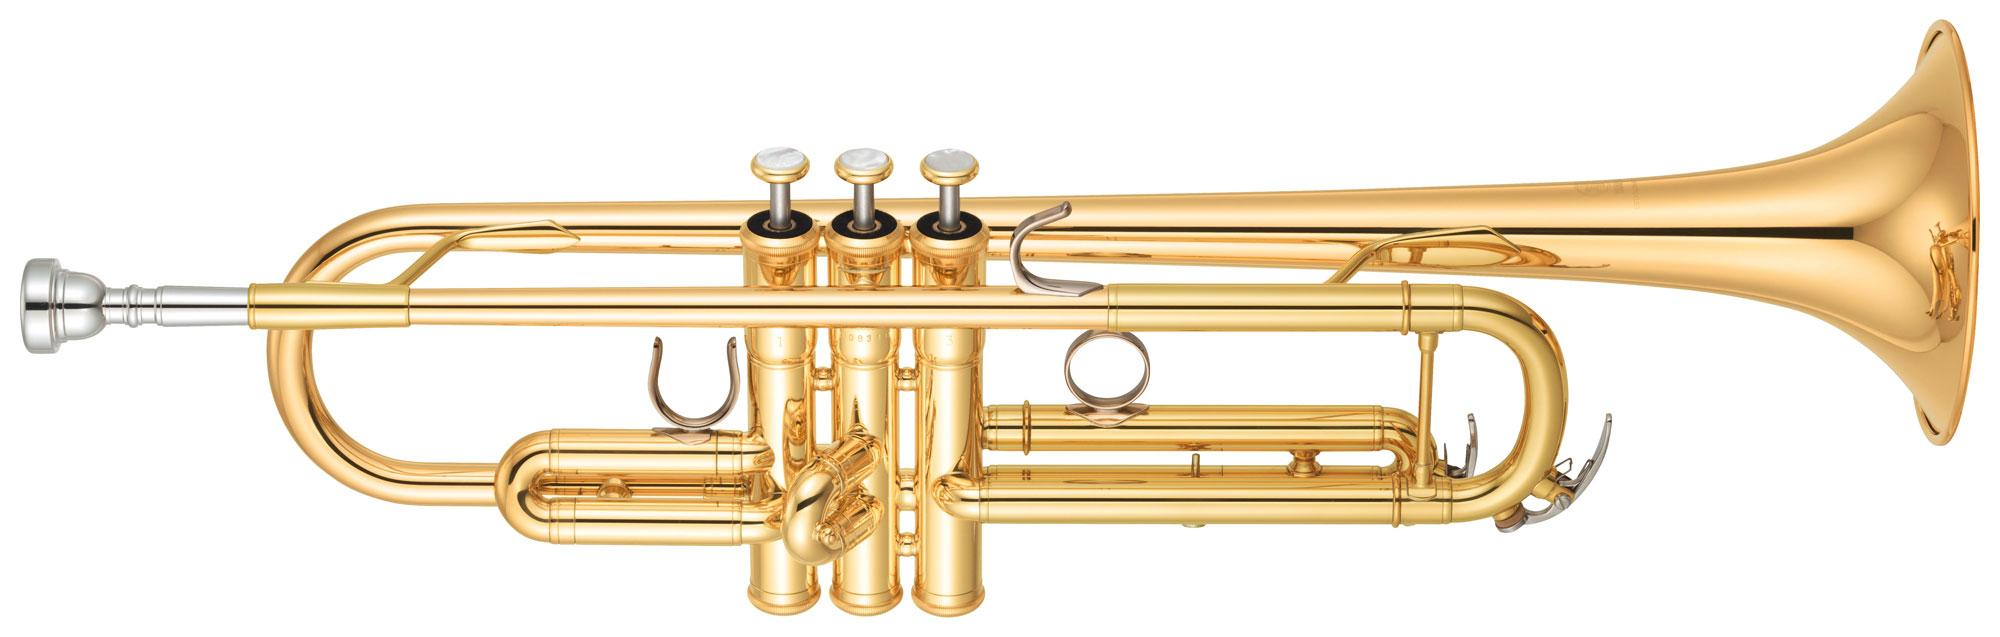 Trompeten - Yamaha YTR 5335GII Trompete - Onlineshop Musikhaus Kirstein